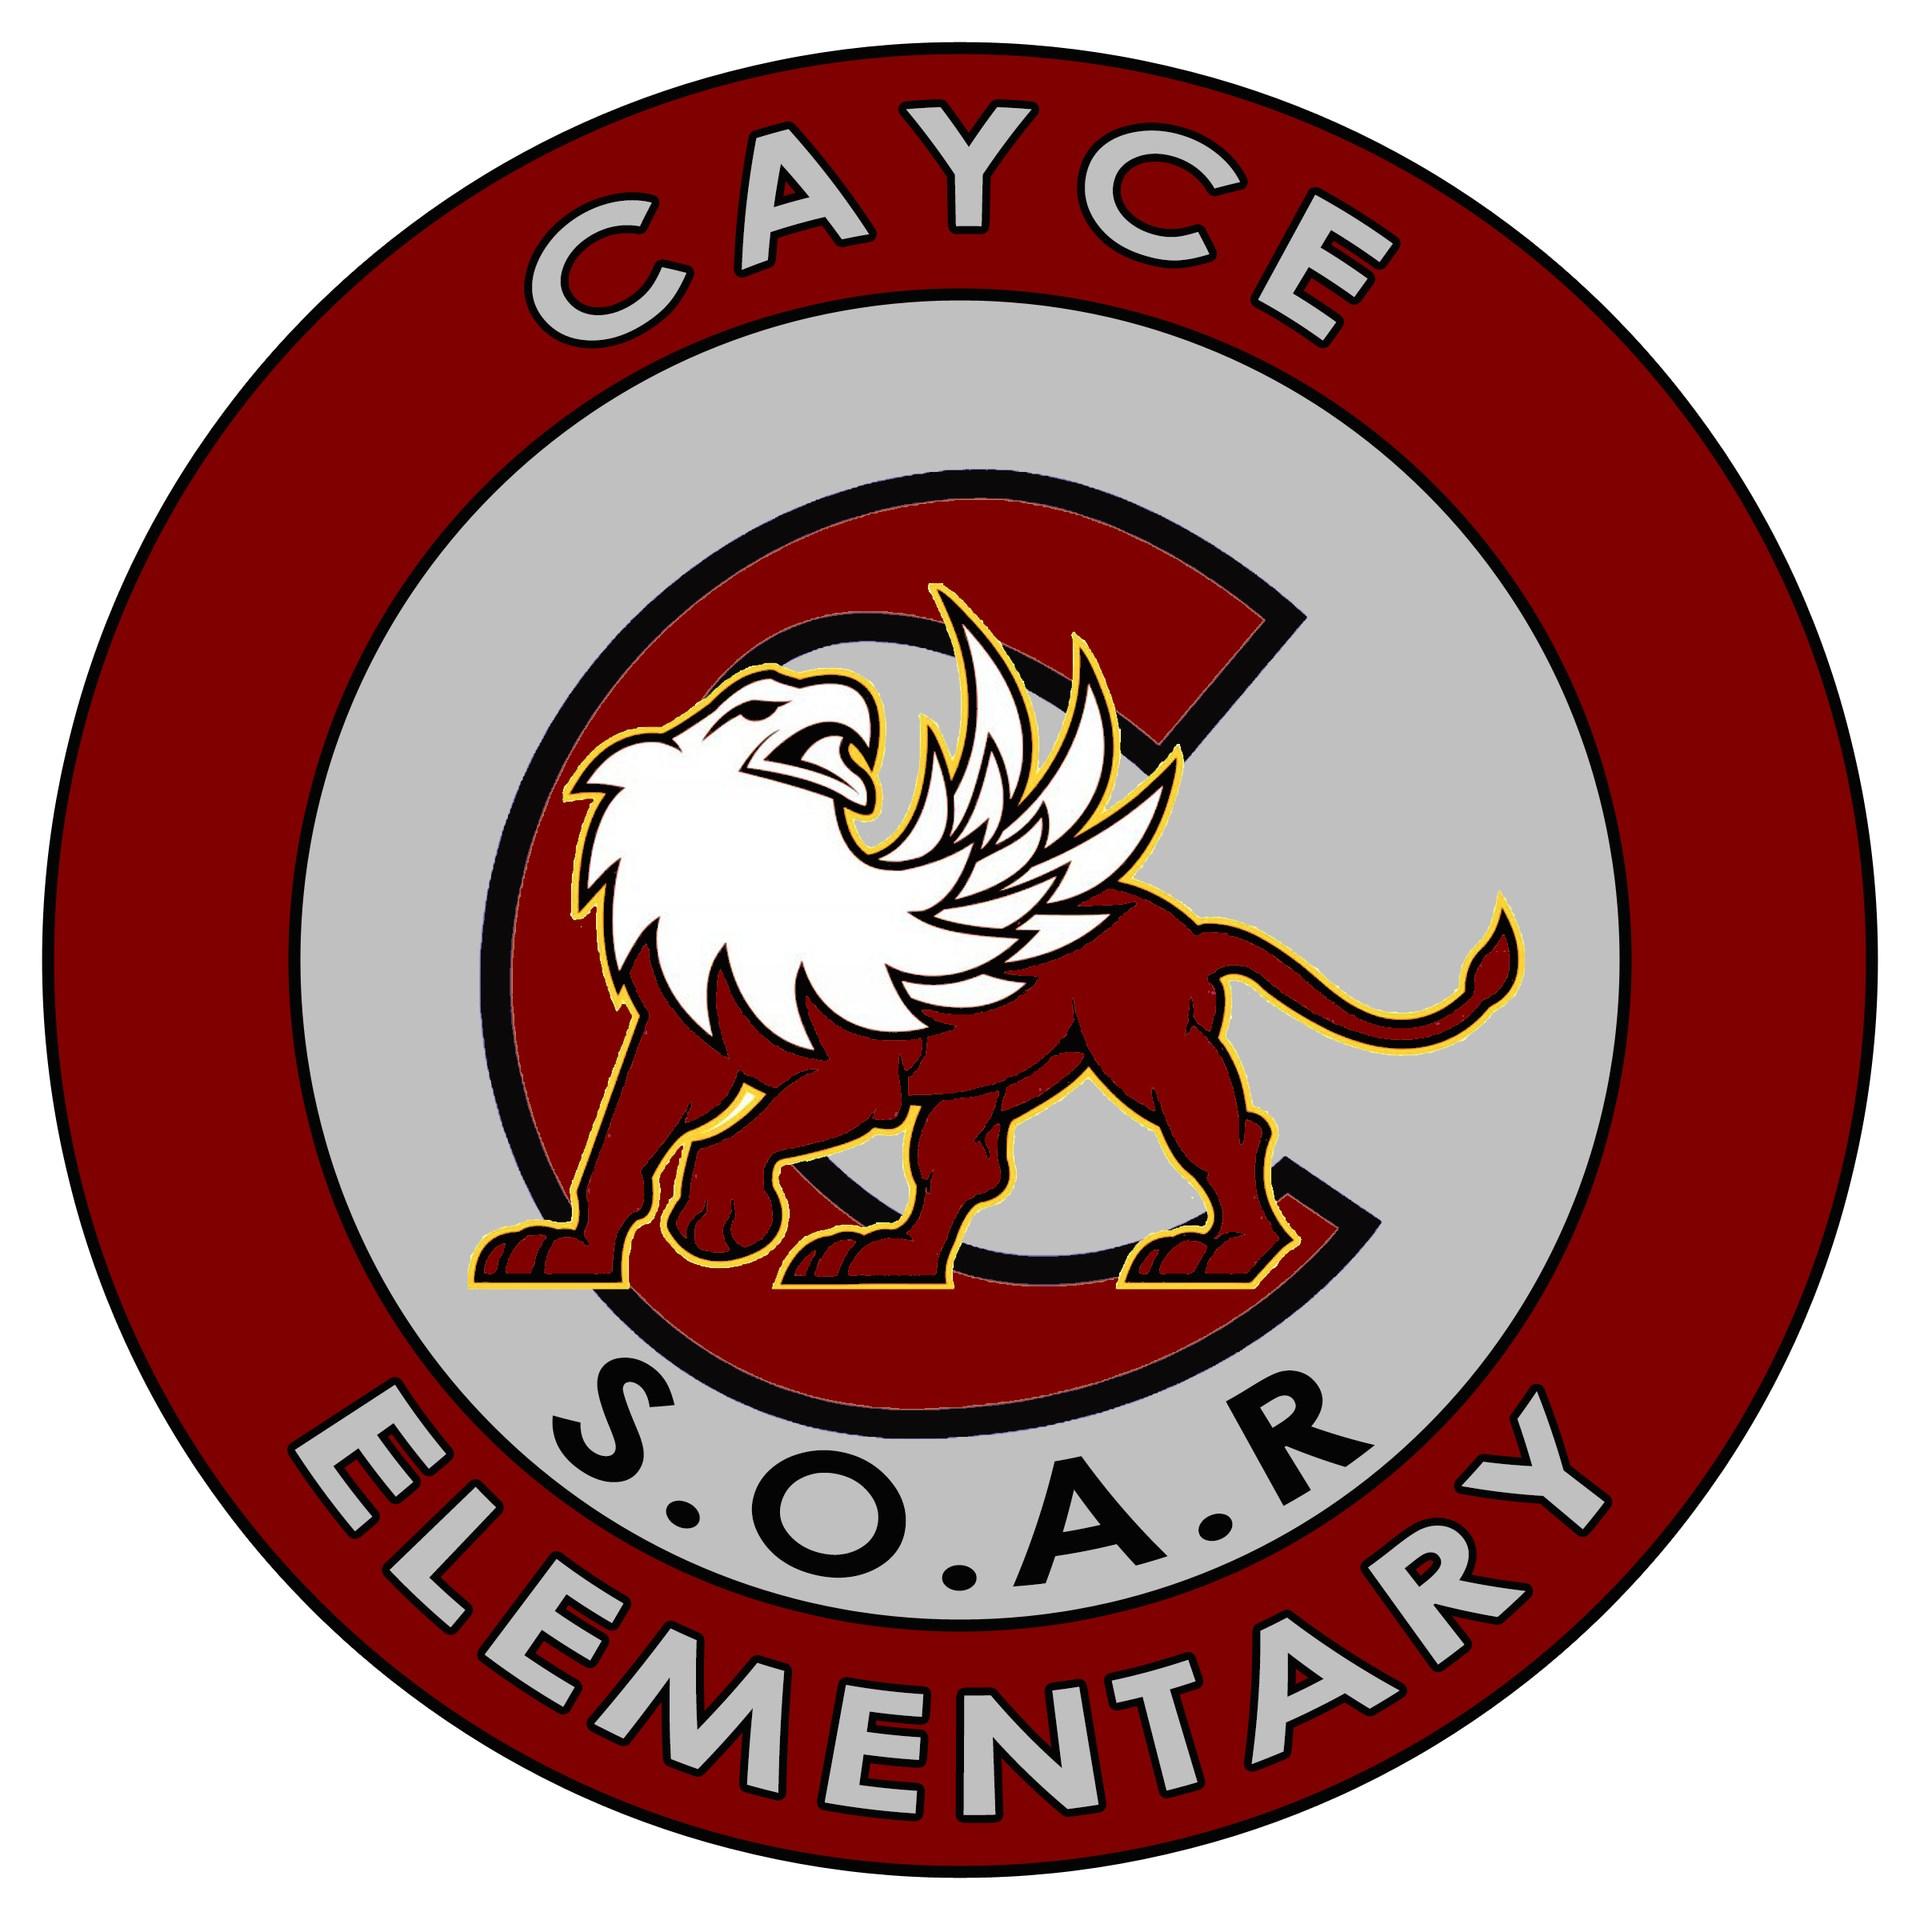 Cayce Elementary Logo